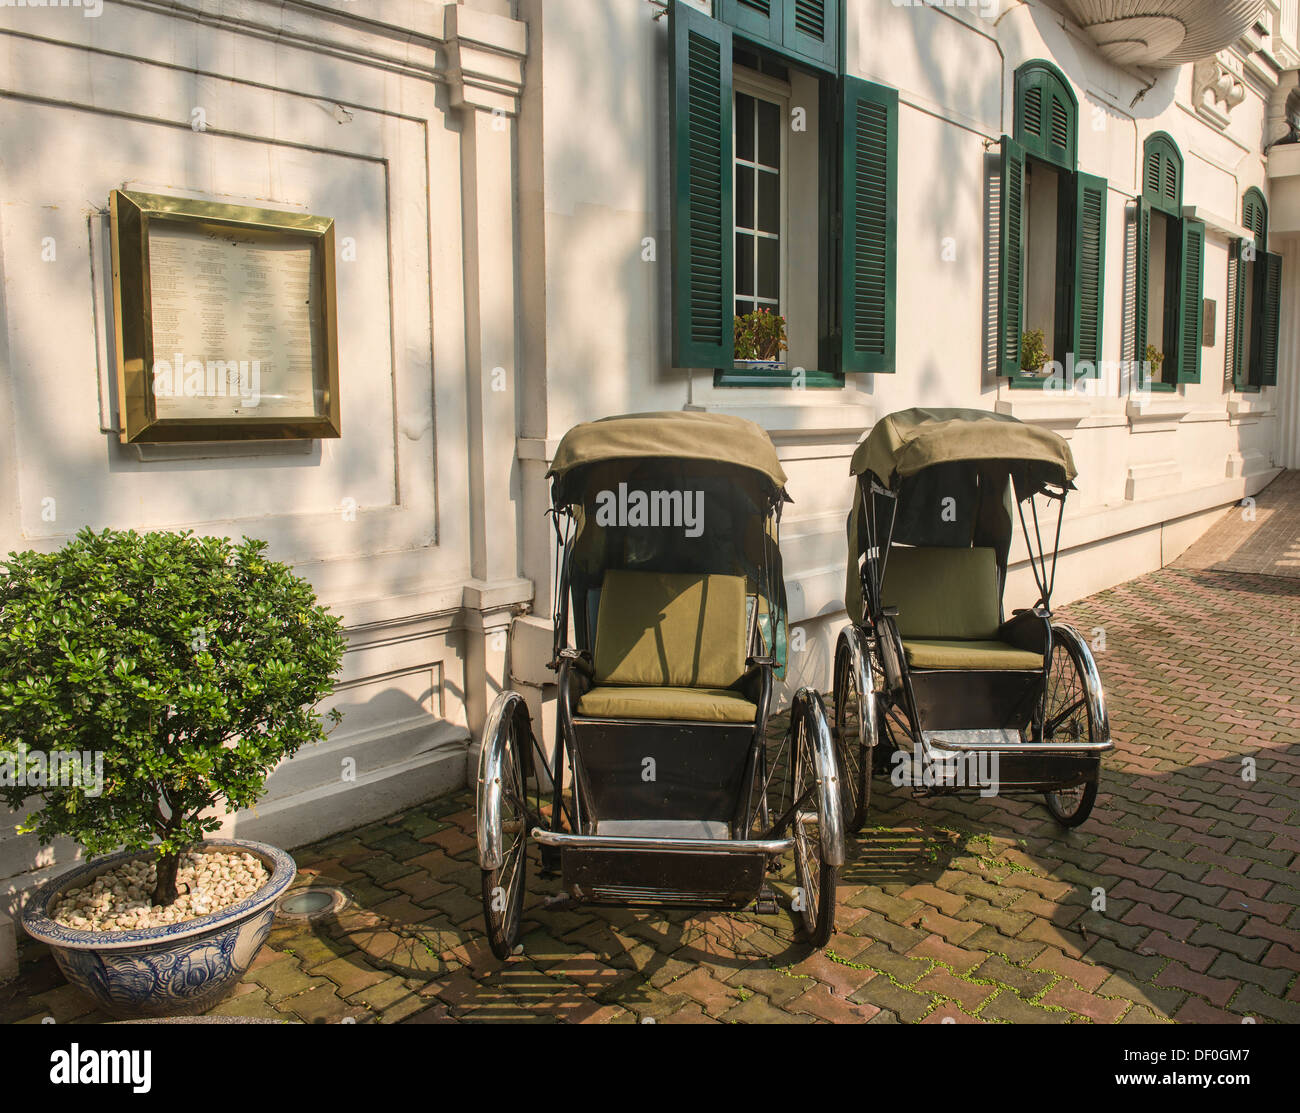 CYCLOS vor dem historischen Metropole Hotel in Hanoi, Vietnam Stockbild